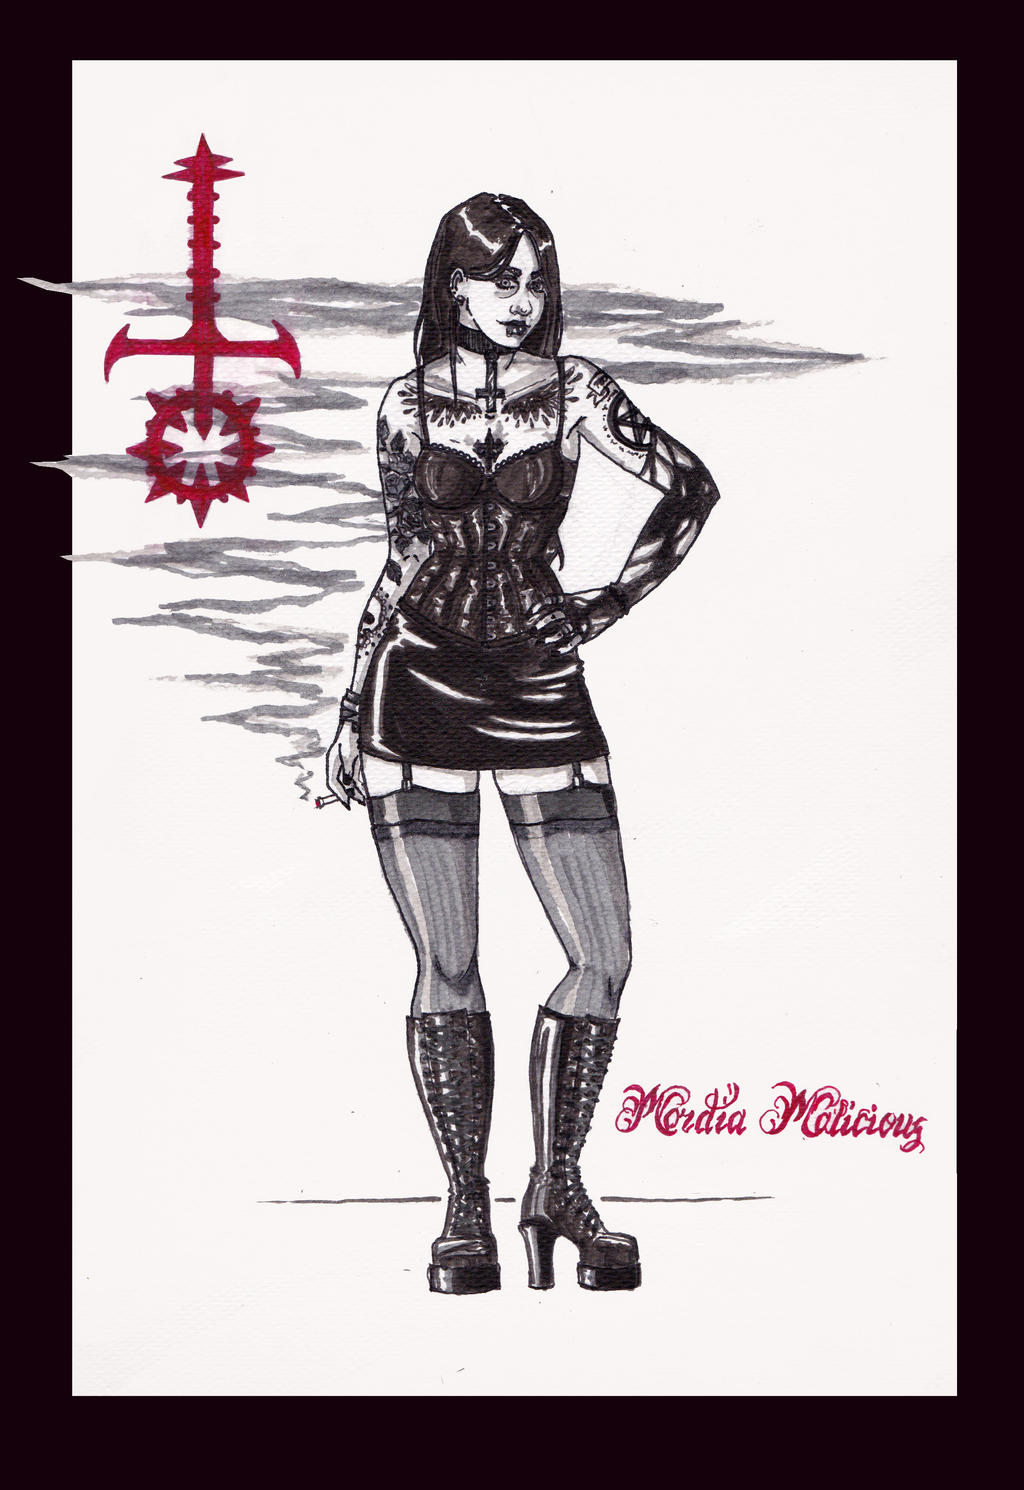 Mordia Malicious by Nirvanangel